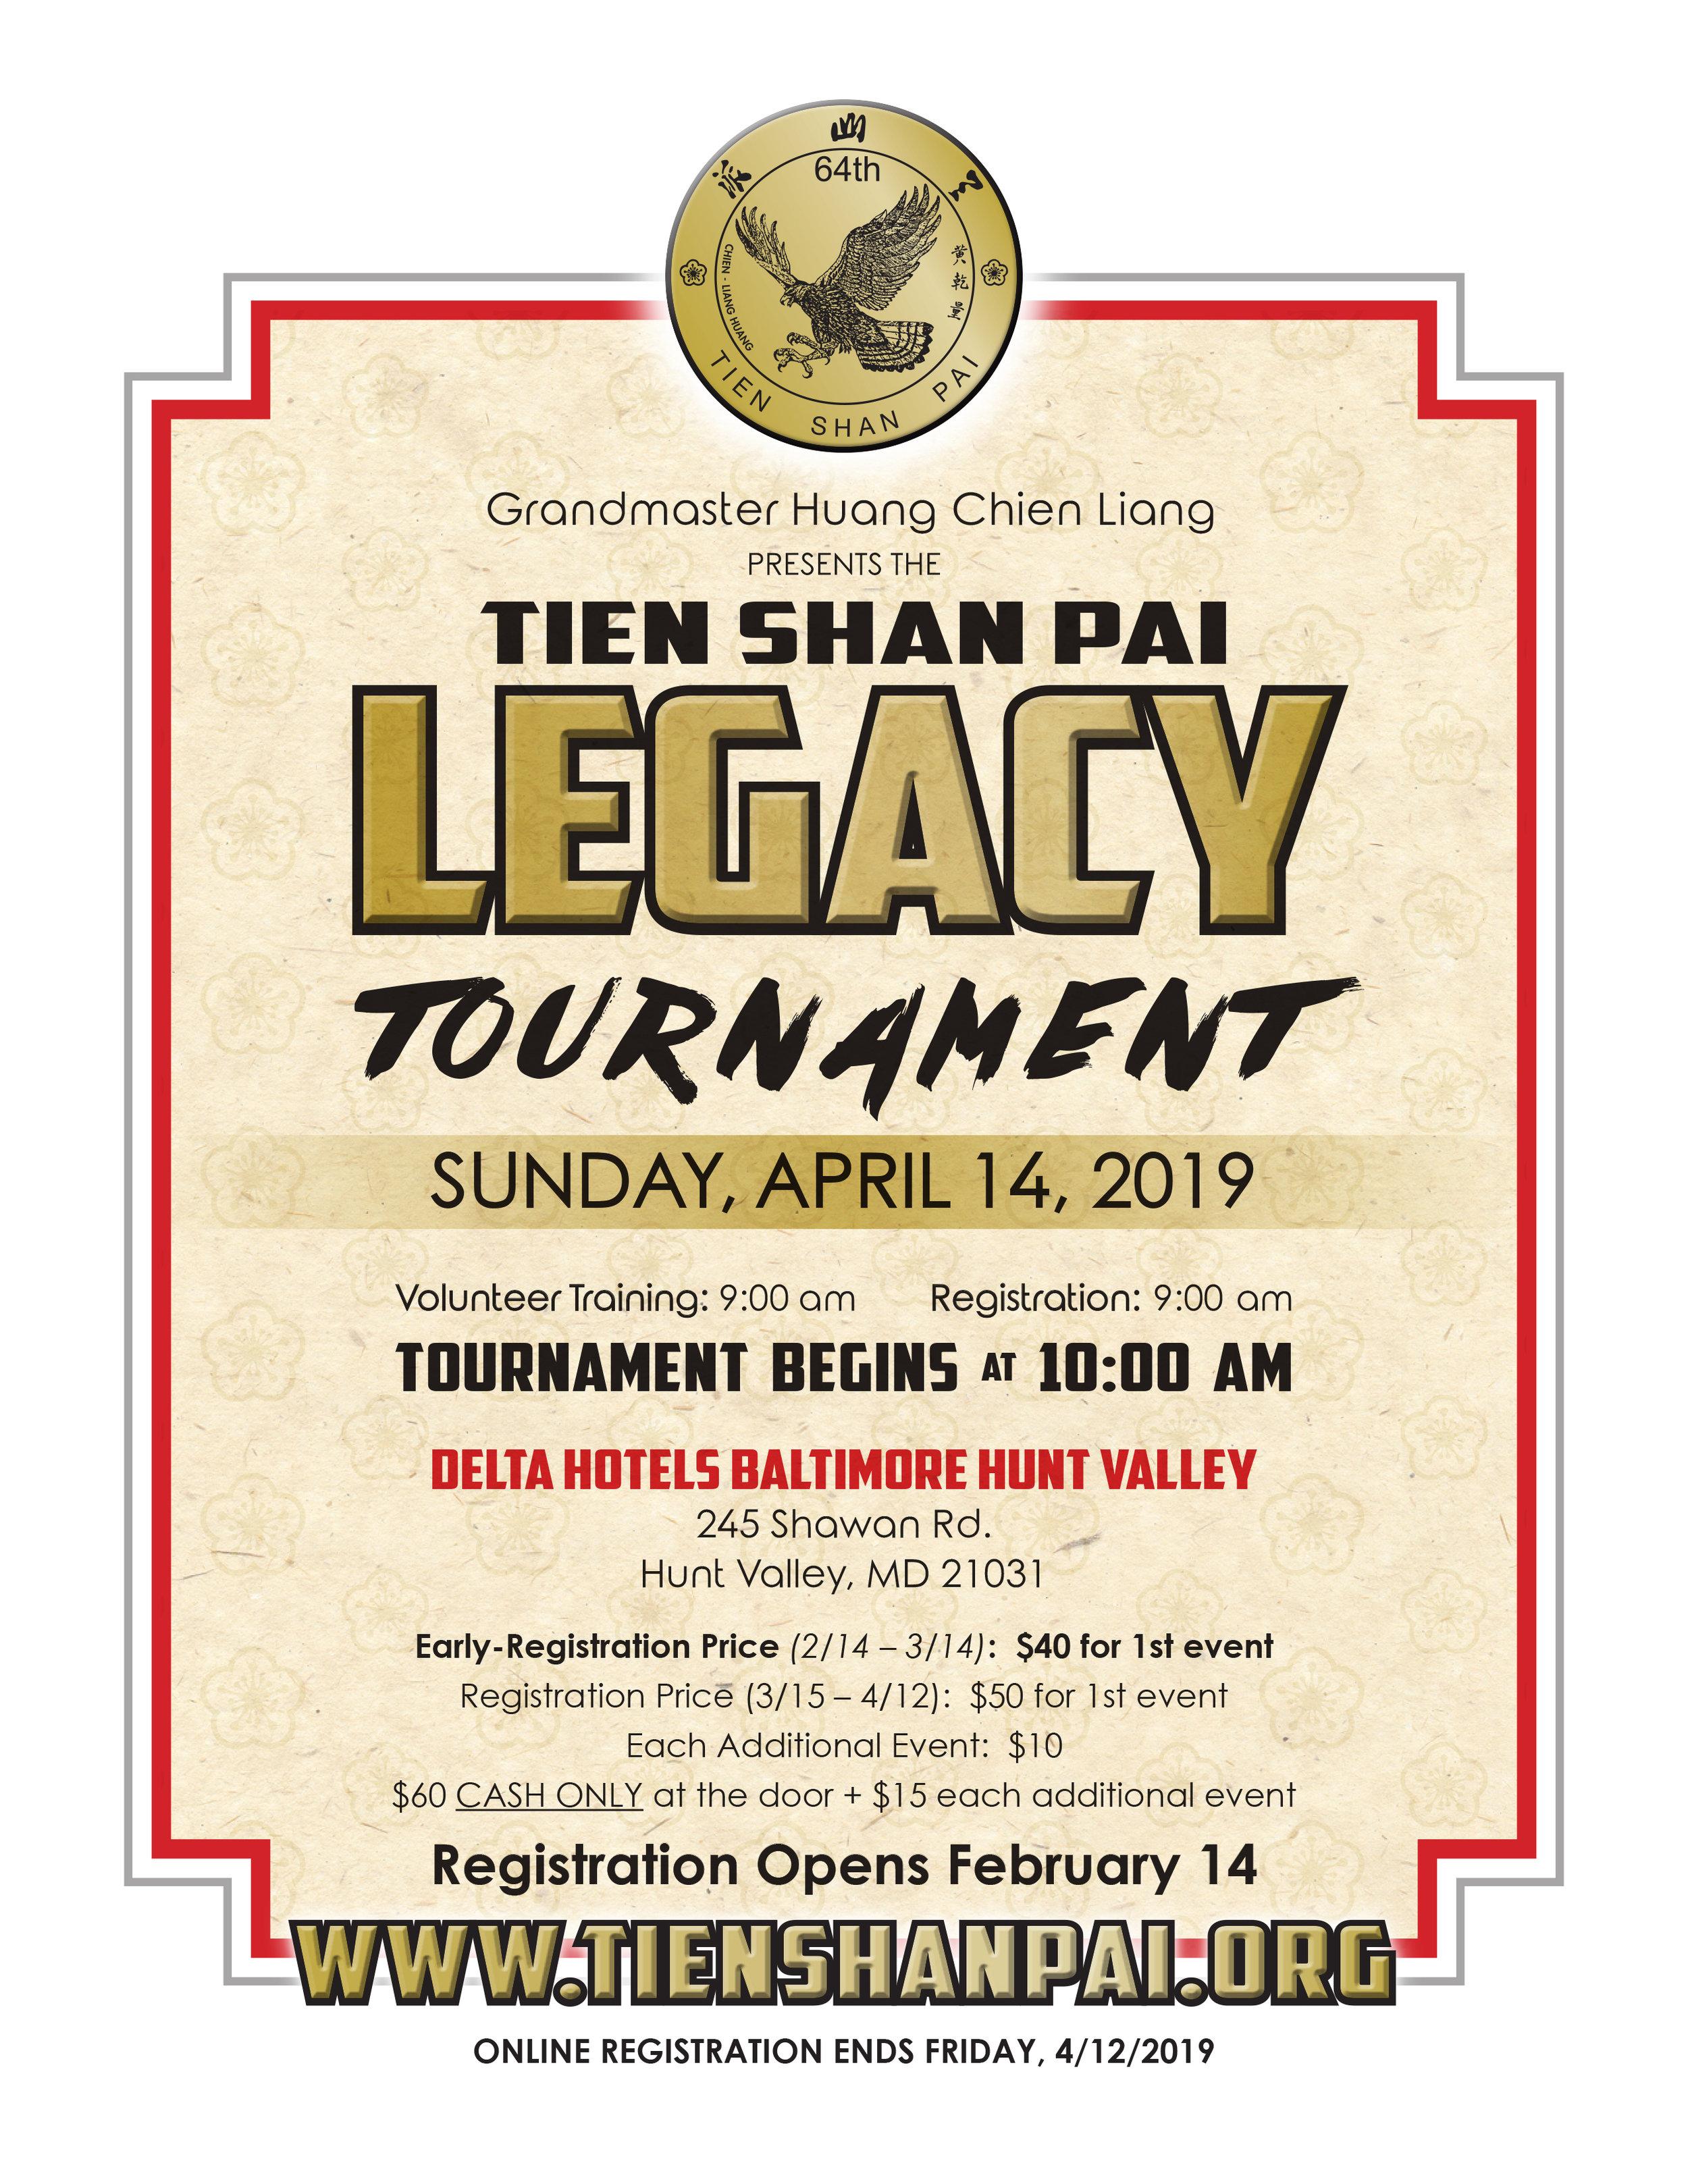 TSP Legacy Tournament 2019 - Flyer Flat.pdf - Adobe Acrobat Professional.jpg